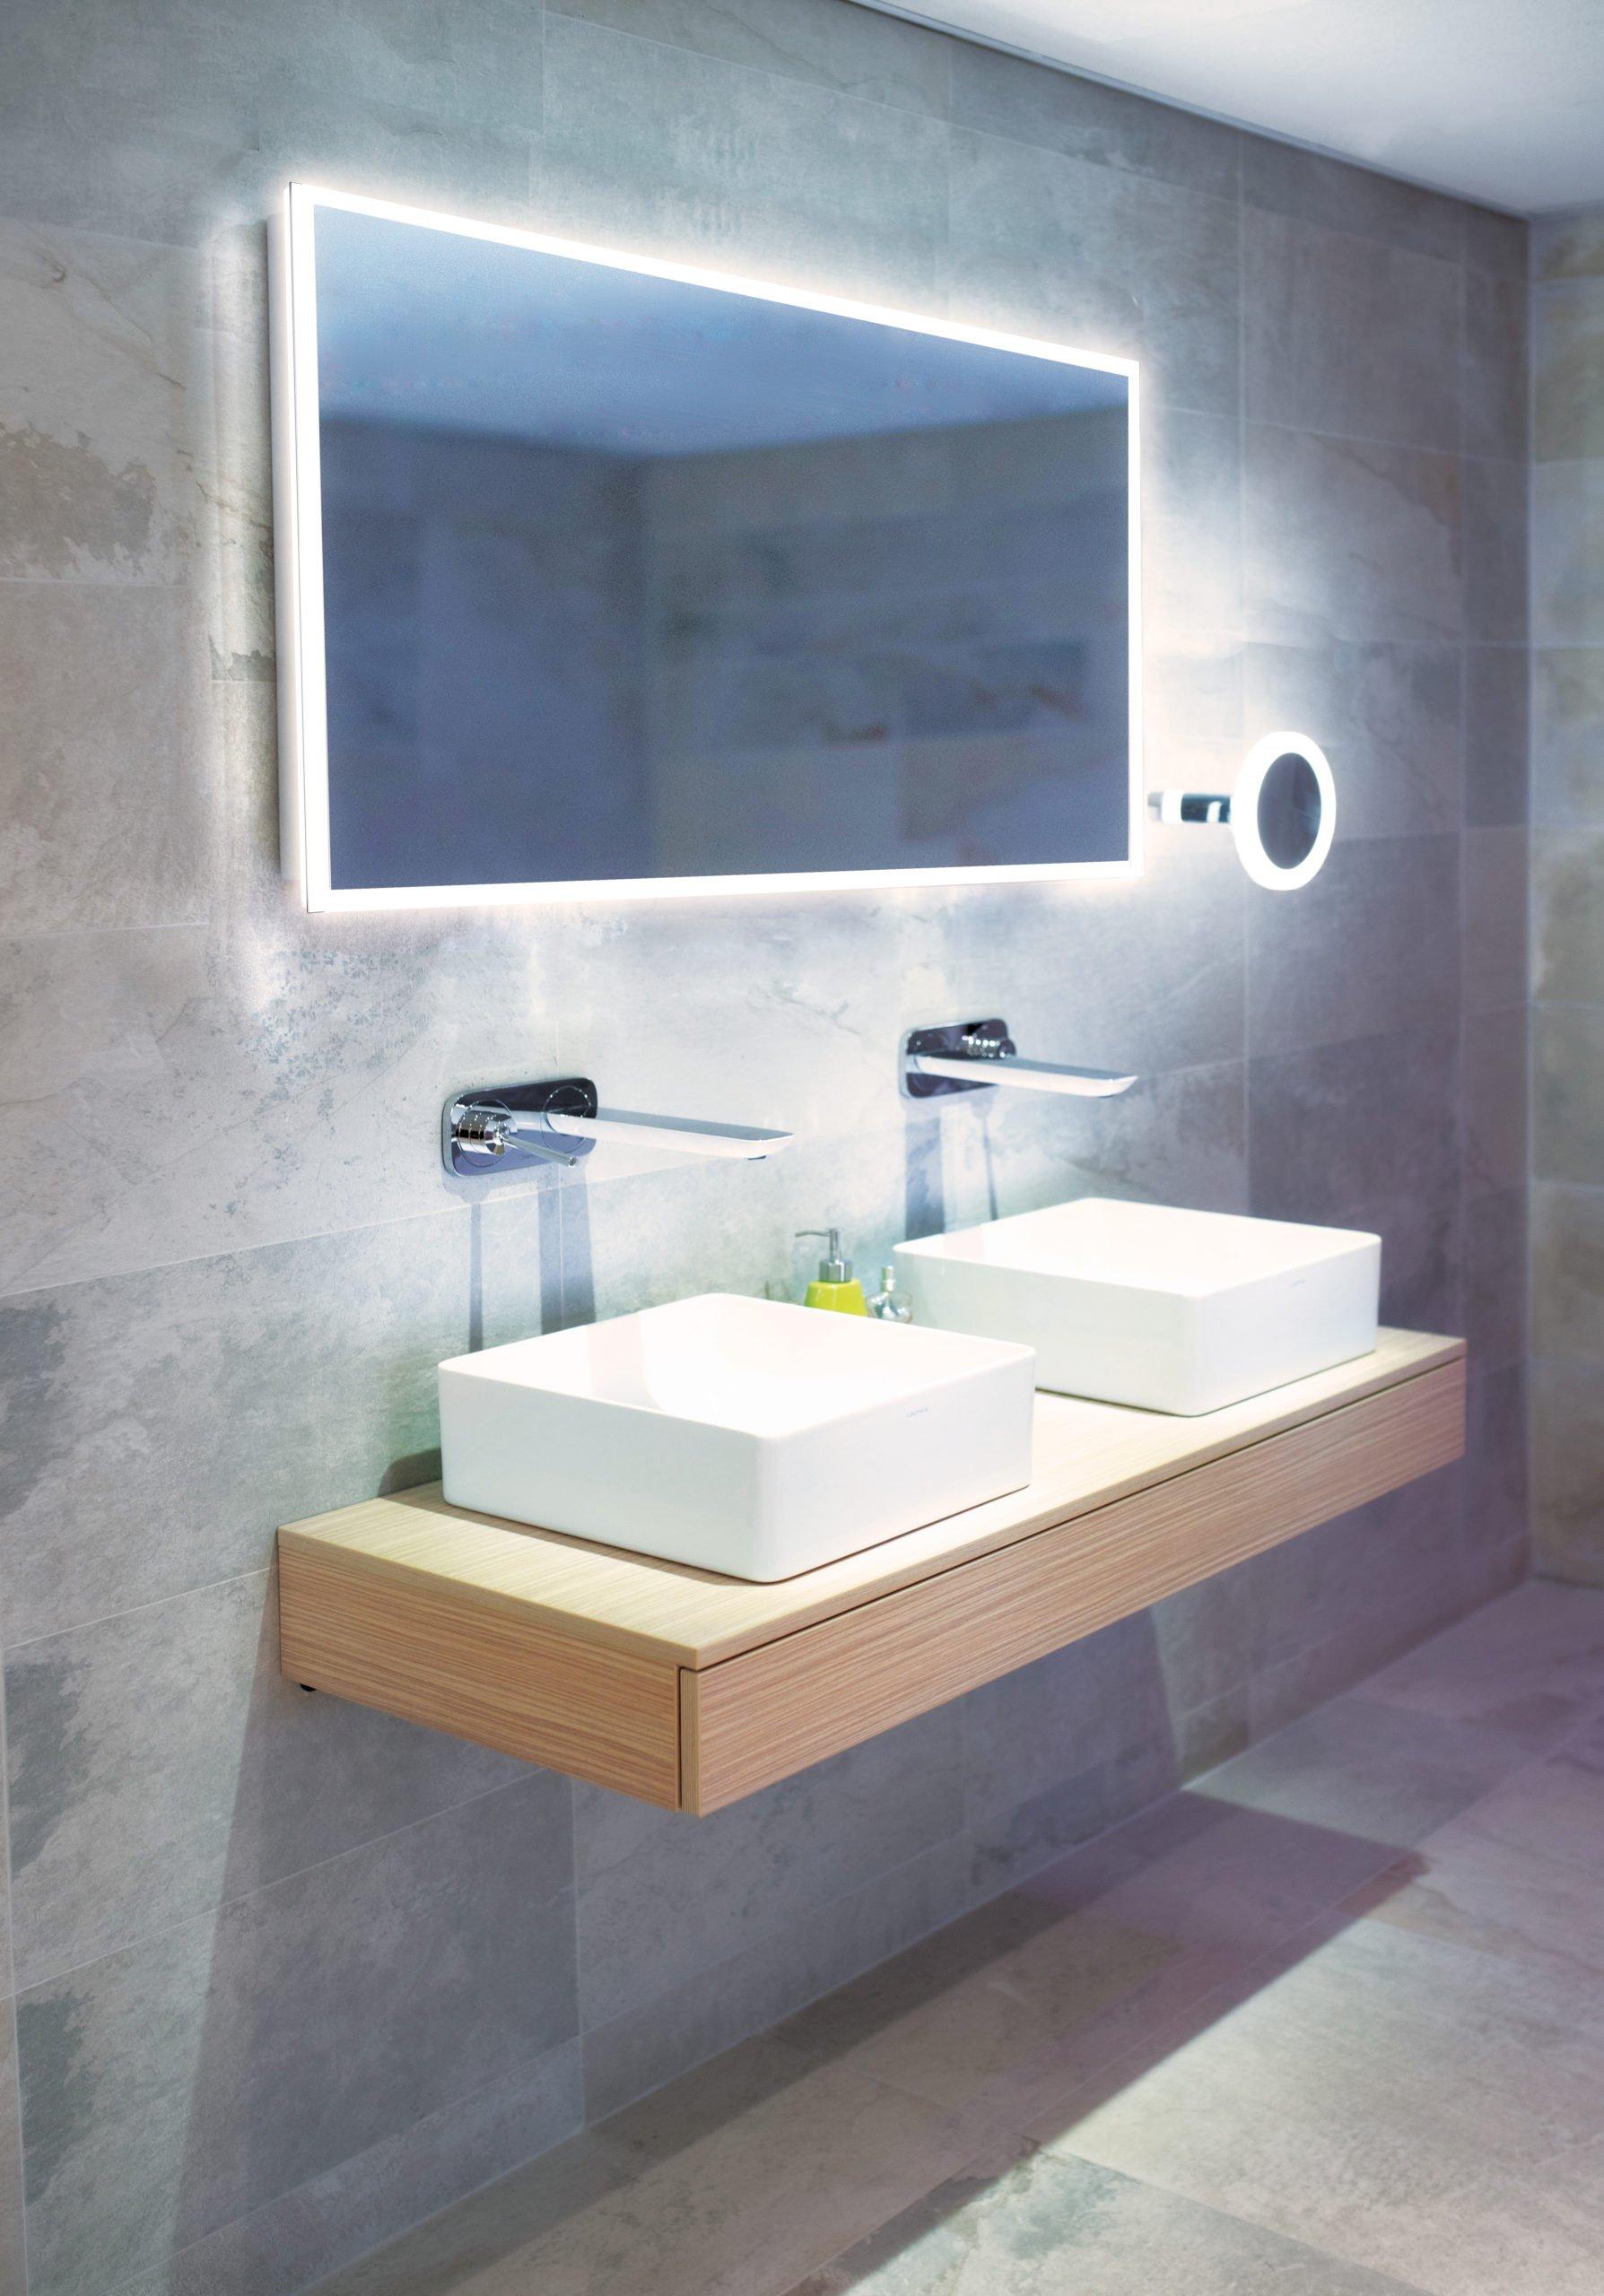 A double basin deserves the best illumination